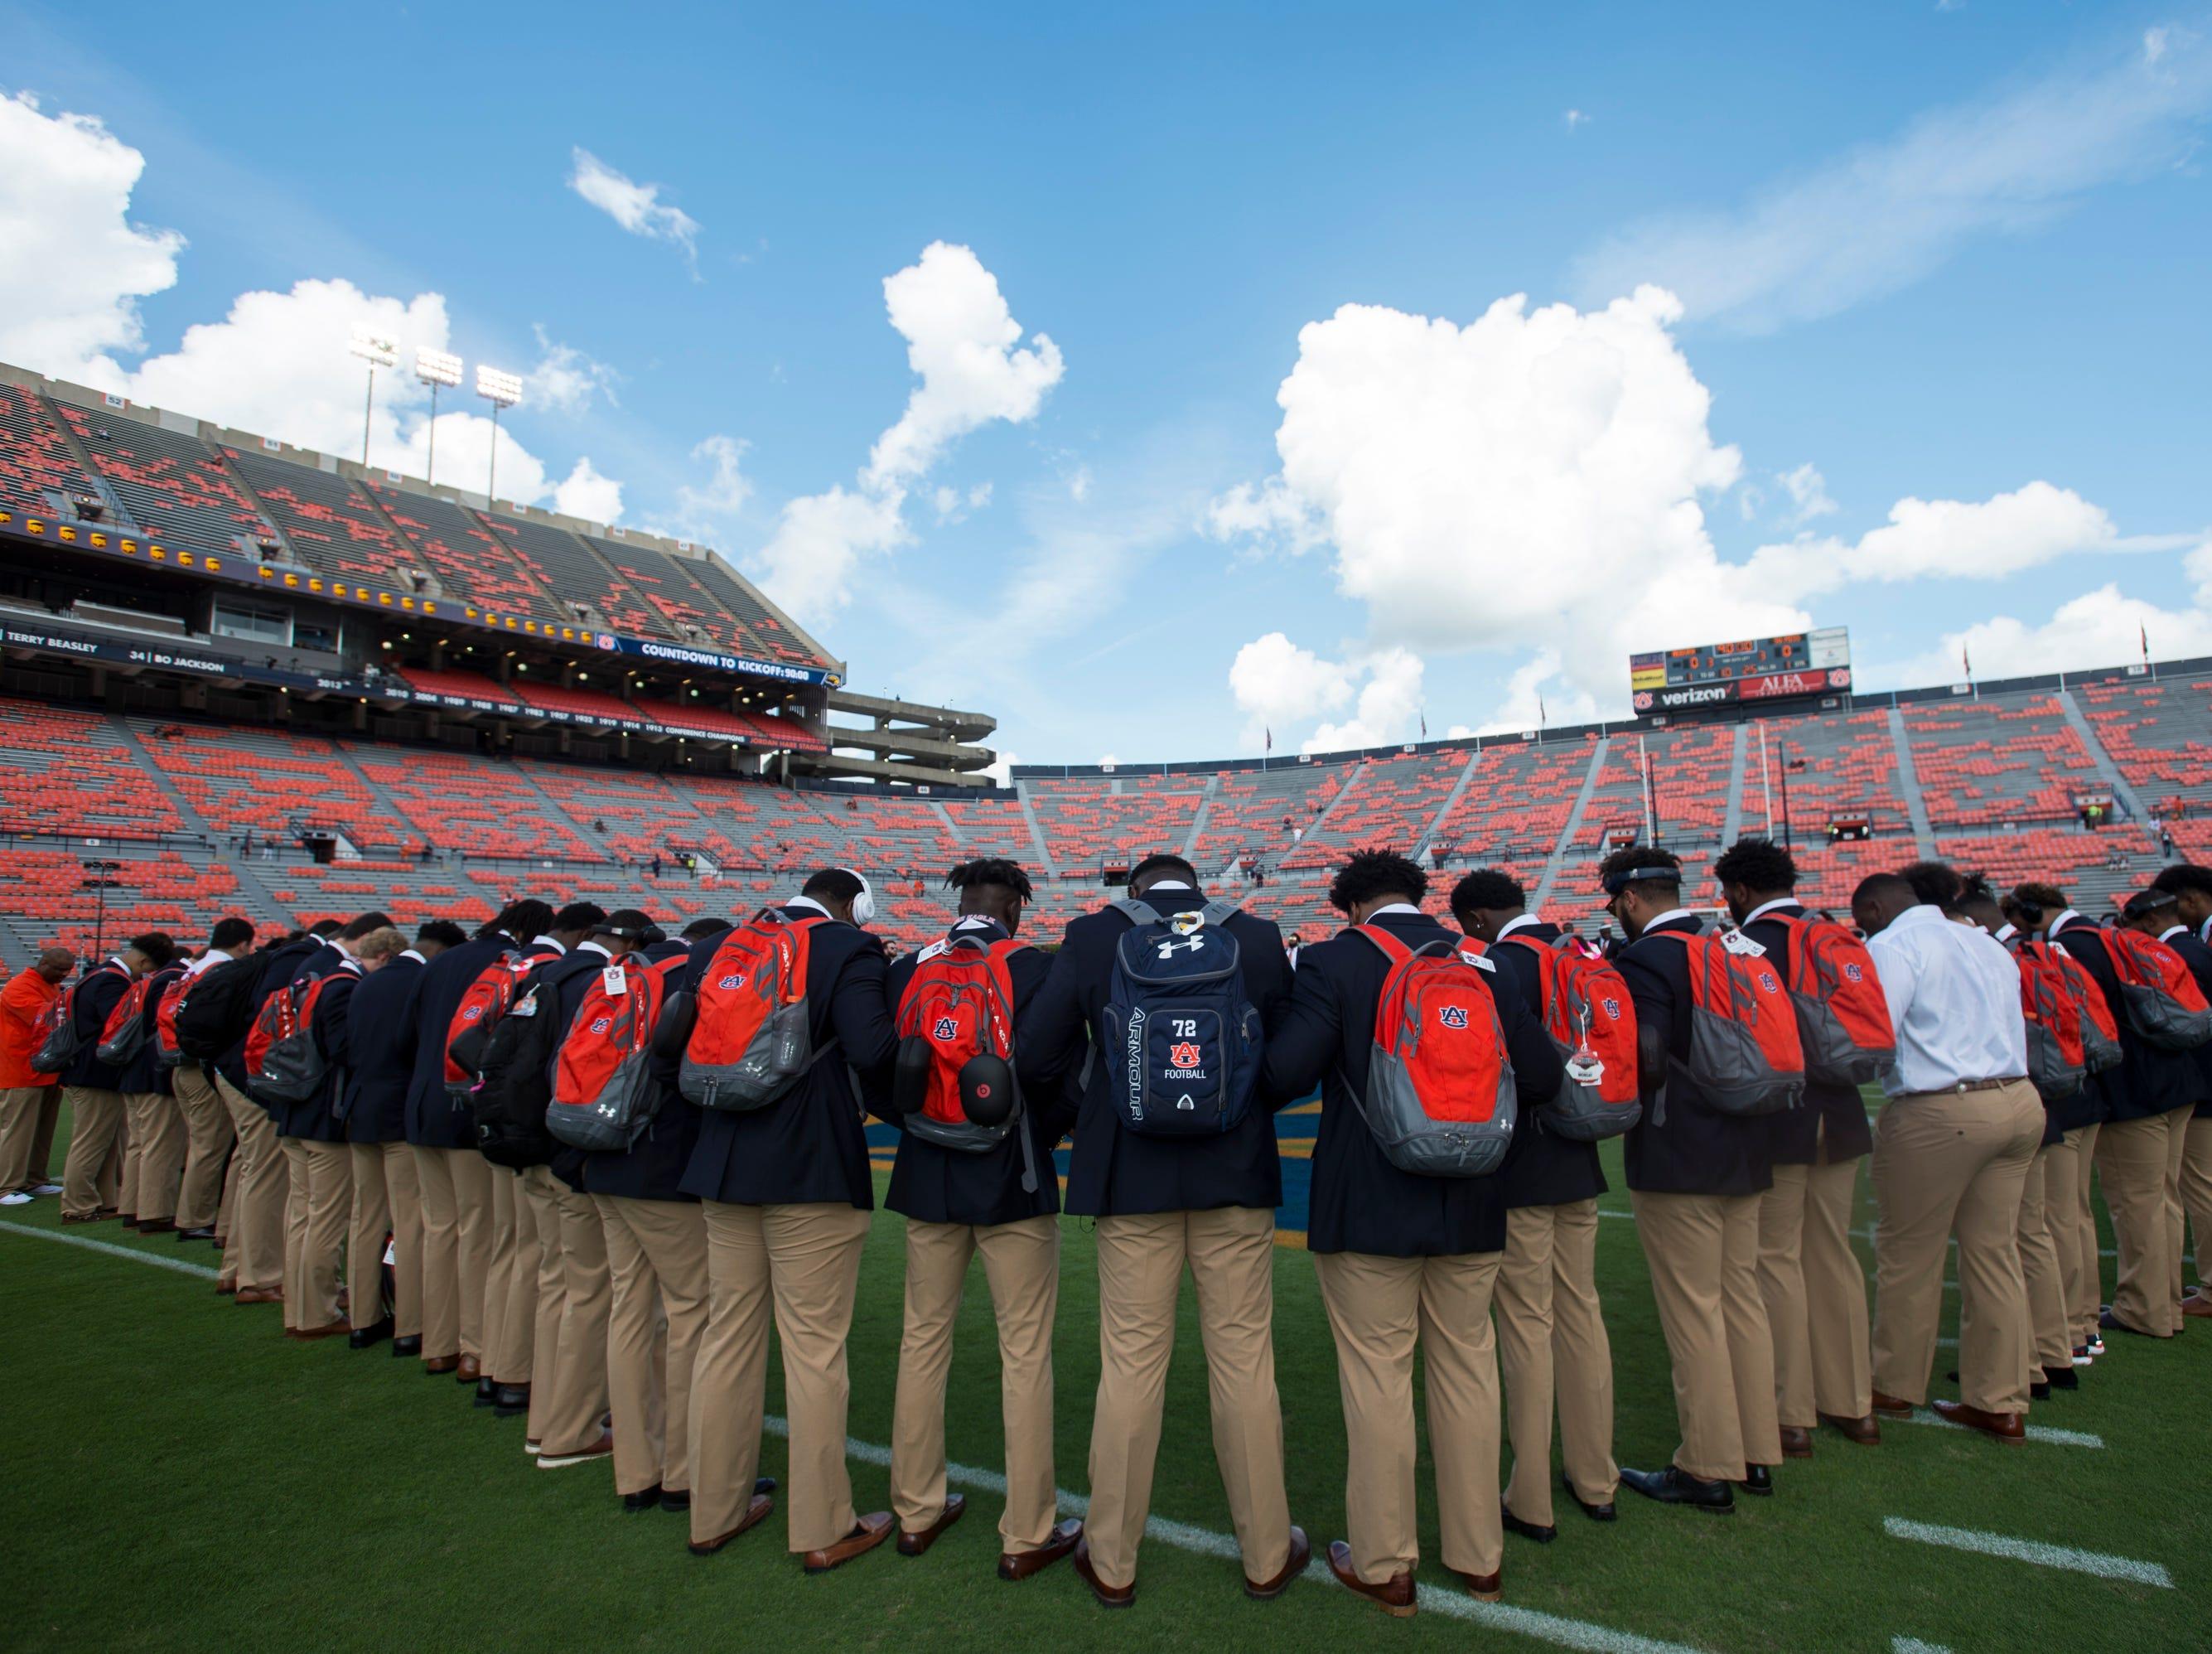 Auburn players huddle and pray on the field following the Tiger Walk at Jordan-Hare Stadium in Auburn, Ala., on Saturday, Sept. 29, 2018.